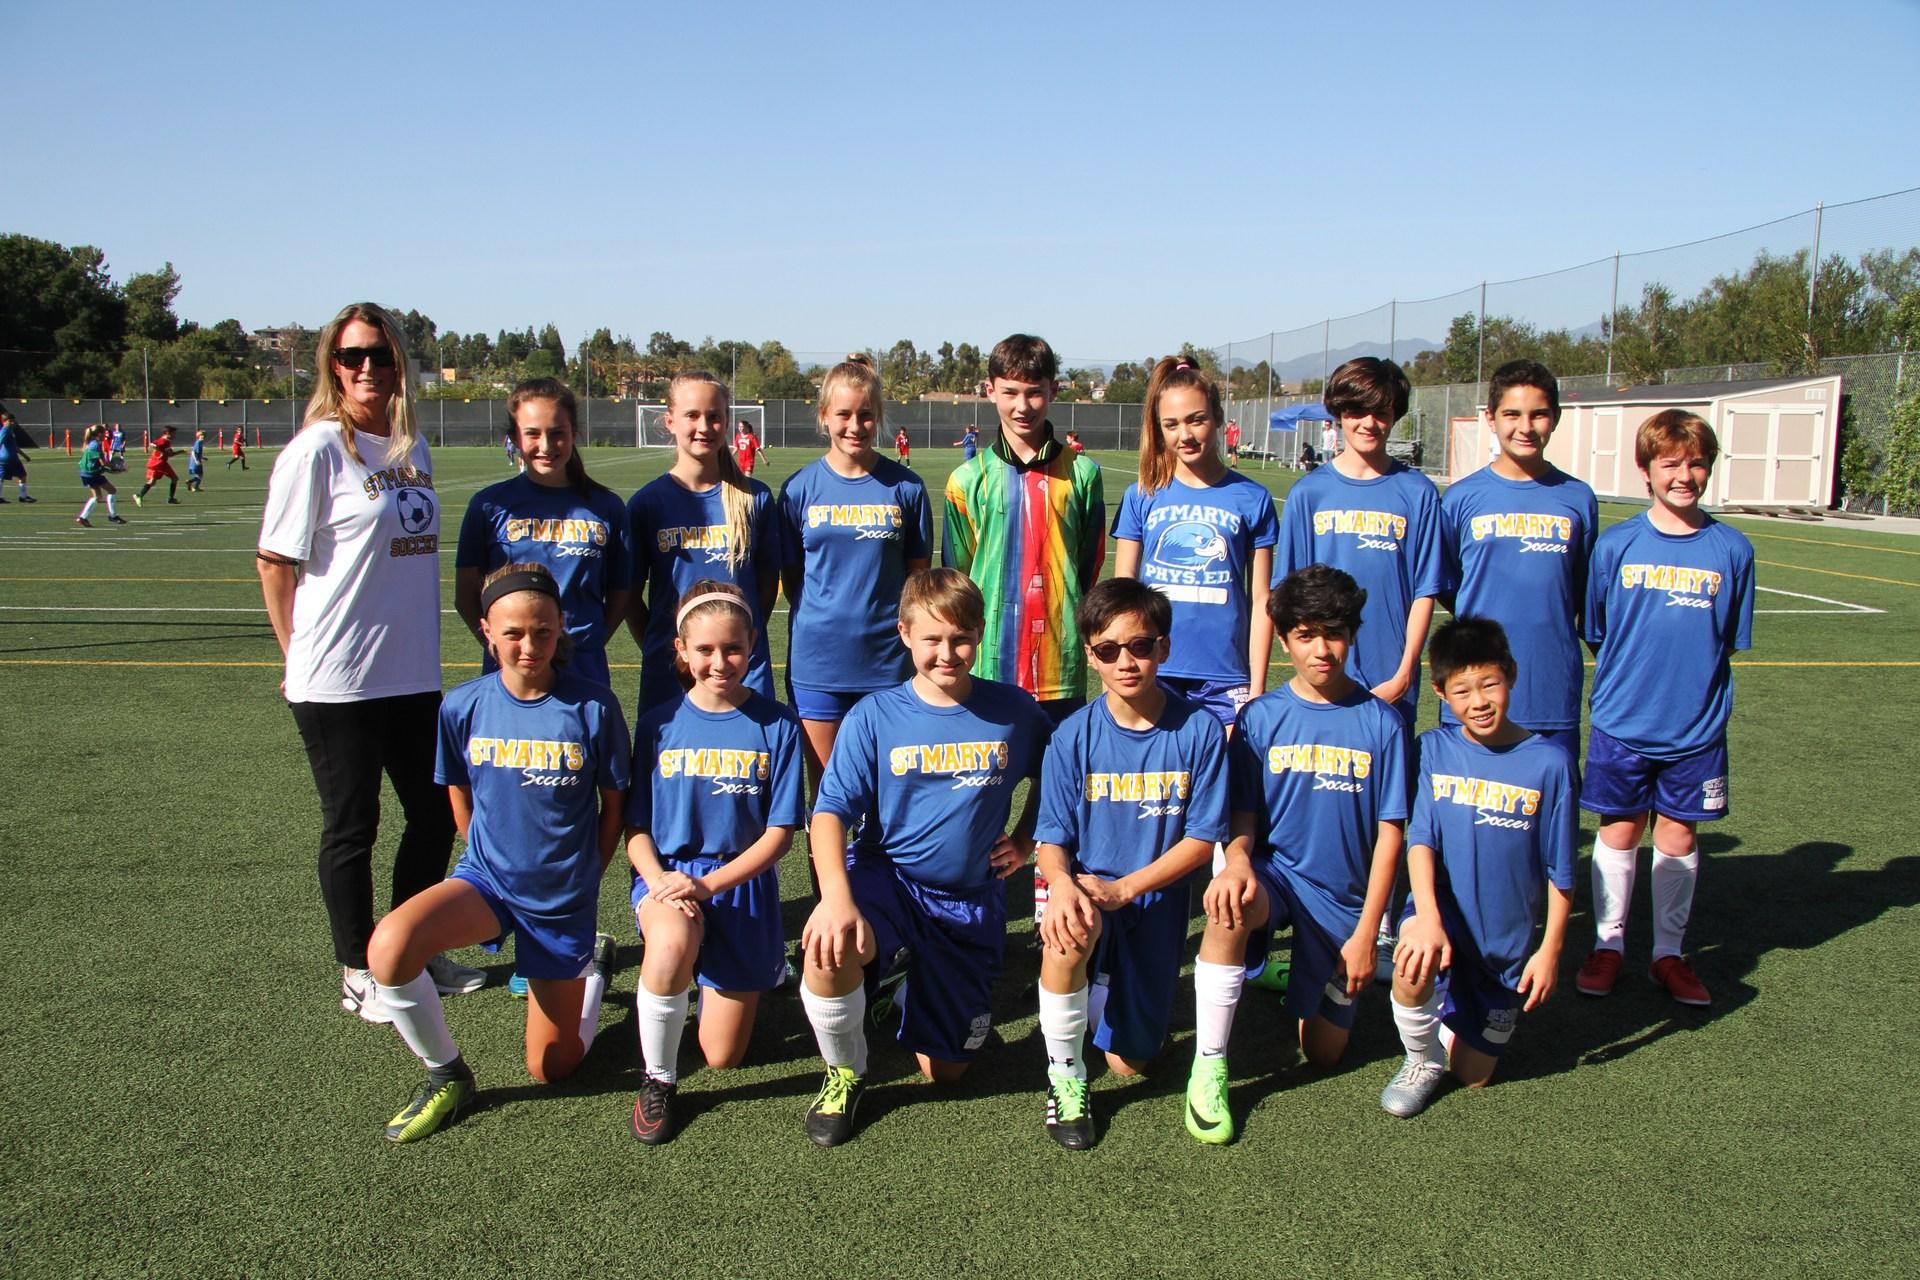 Mountain B coed soccer team